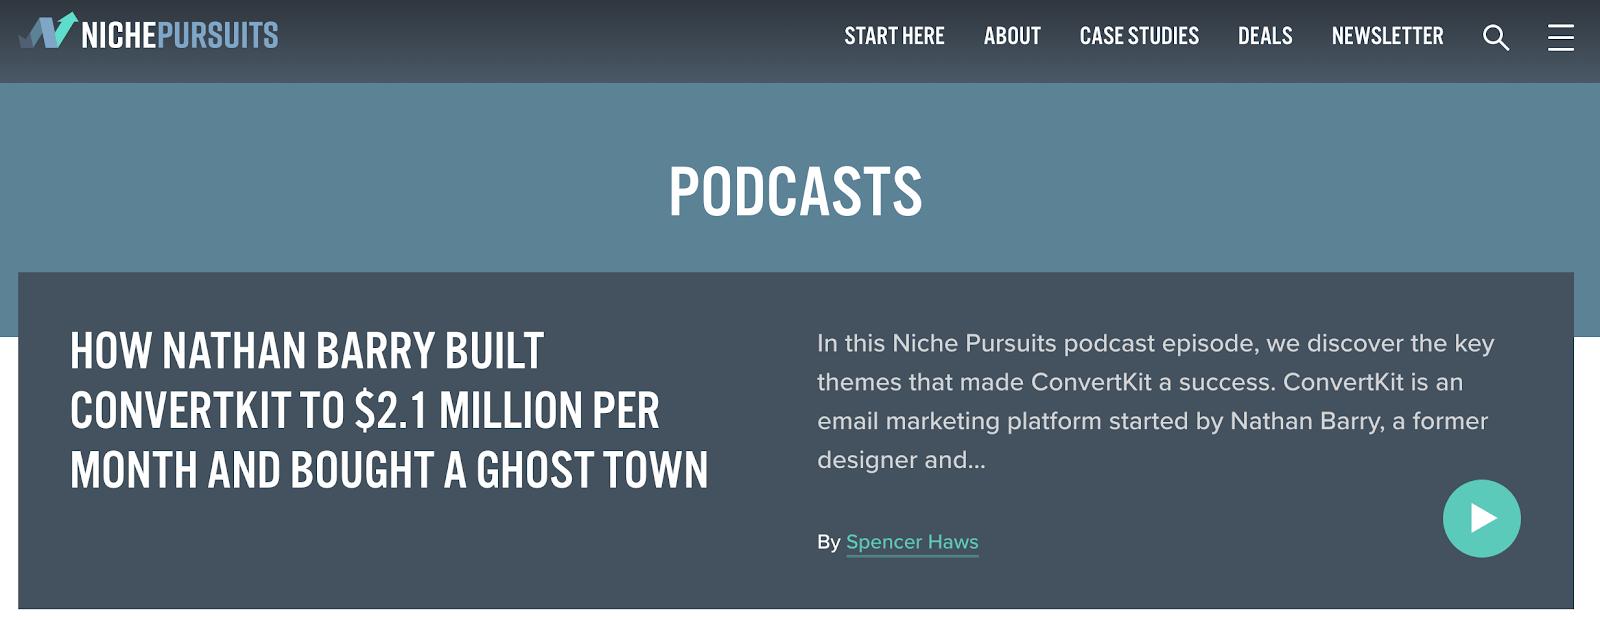 podcast را دنبال می کنید